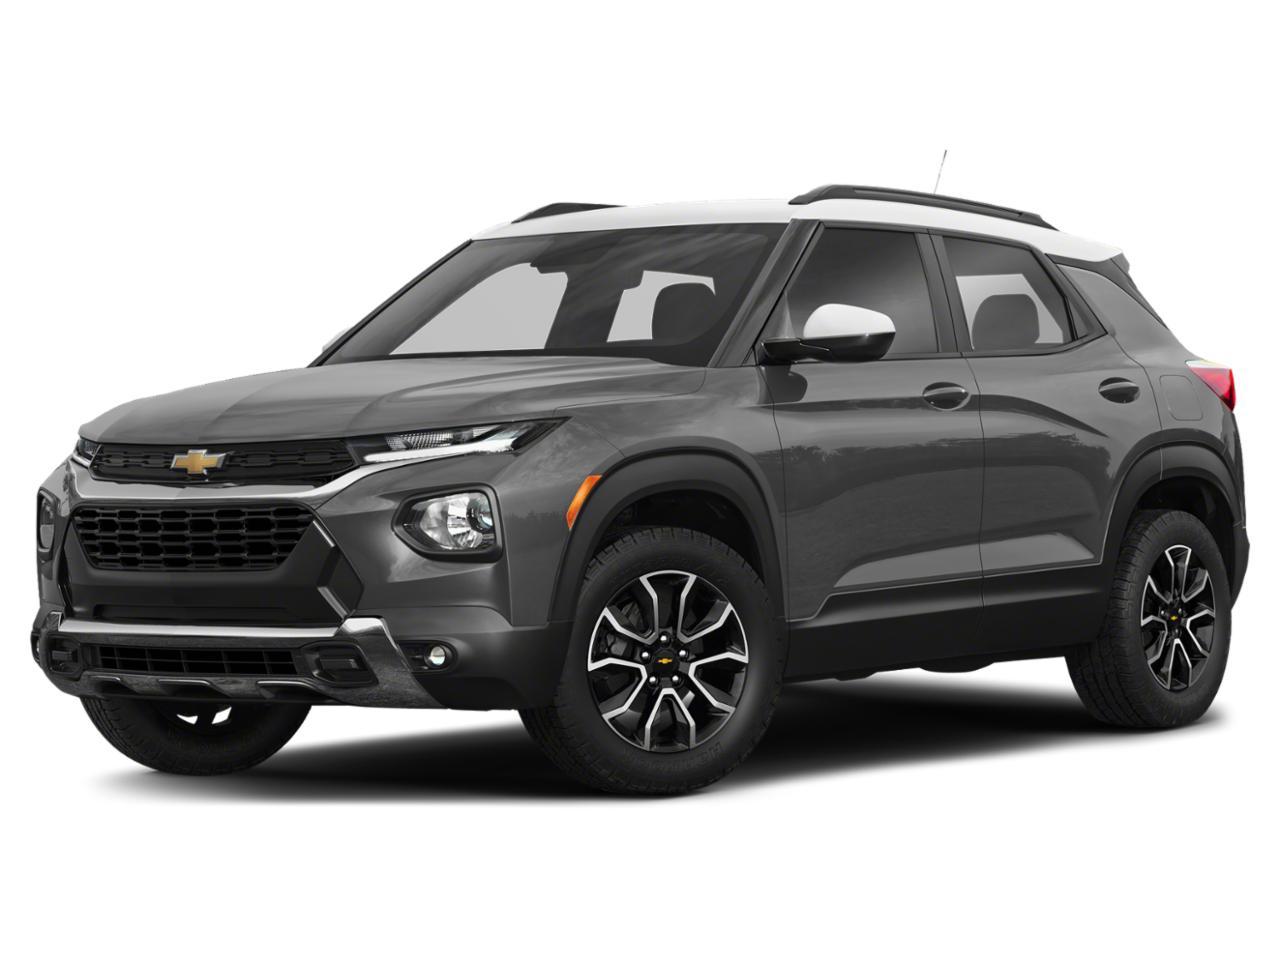 2021 Chevrolet Trailblazer Vehicle Photo in Washington, NJ 07882